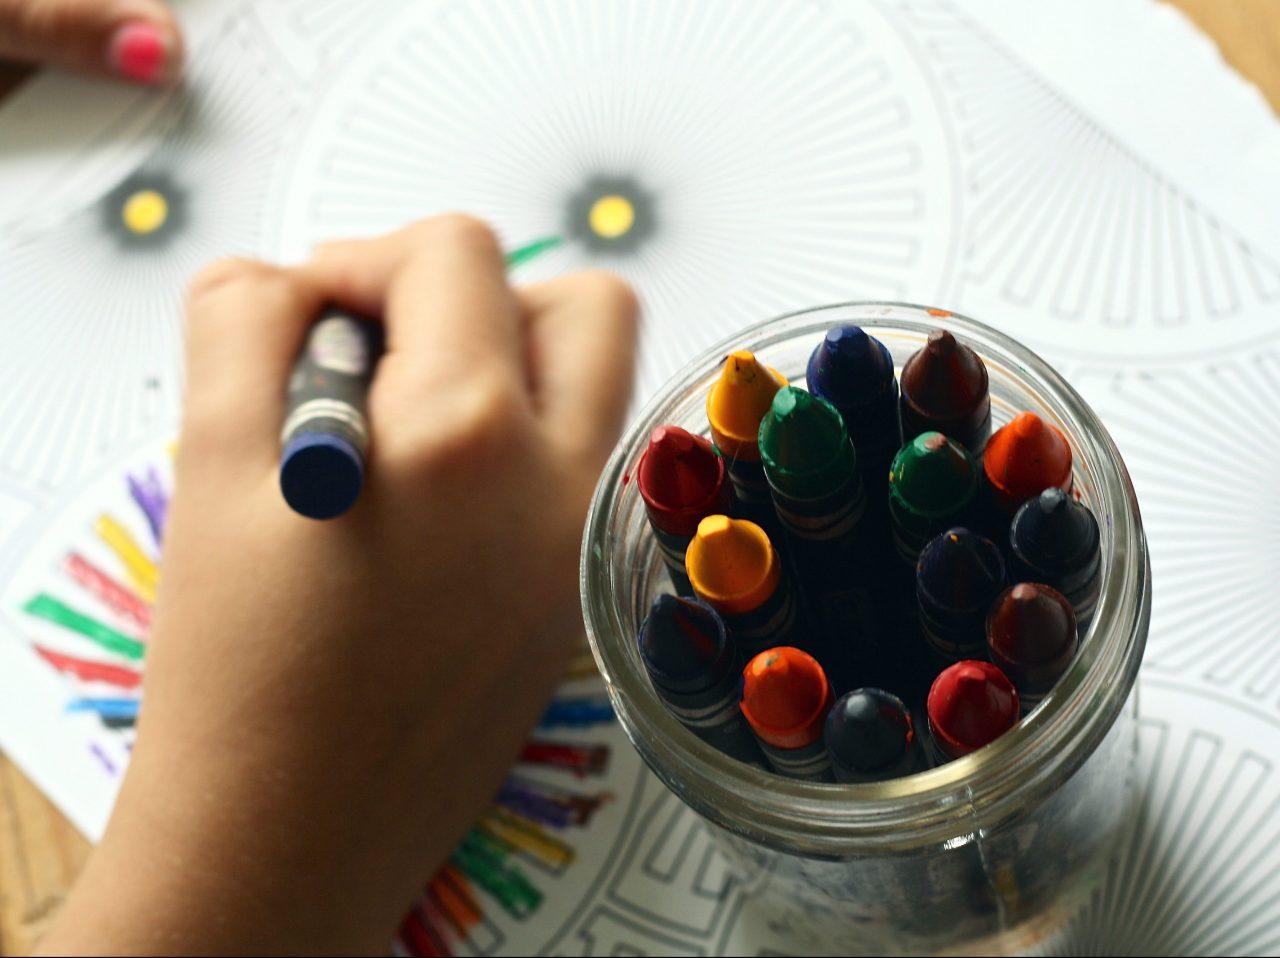 https://s3-ap-southeast-1.amazonaws.com/mindchamps-prod-wp/wp-content/uploads/2017/08/16142833/crayons-coloring-book-coloring-book-159579-e1502696480528-1280x958.jpeg